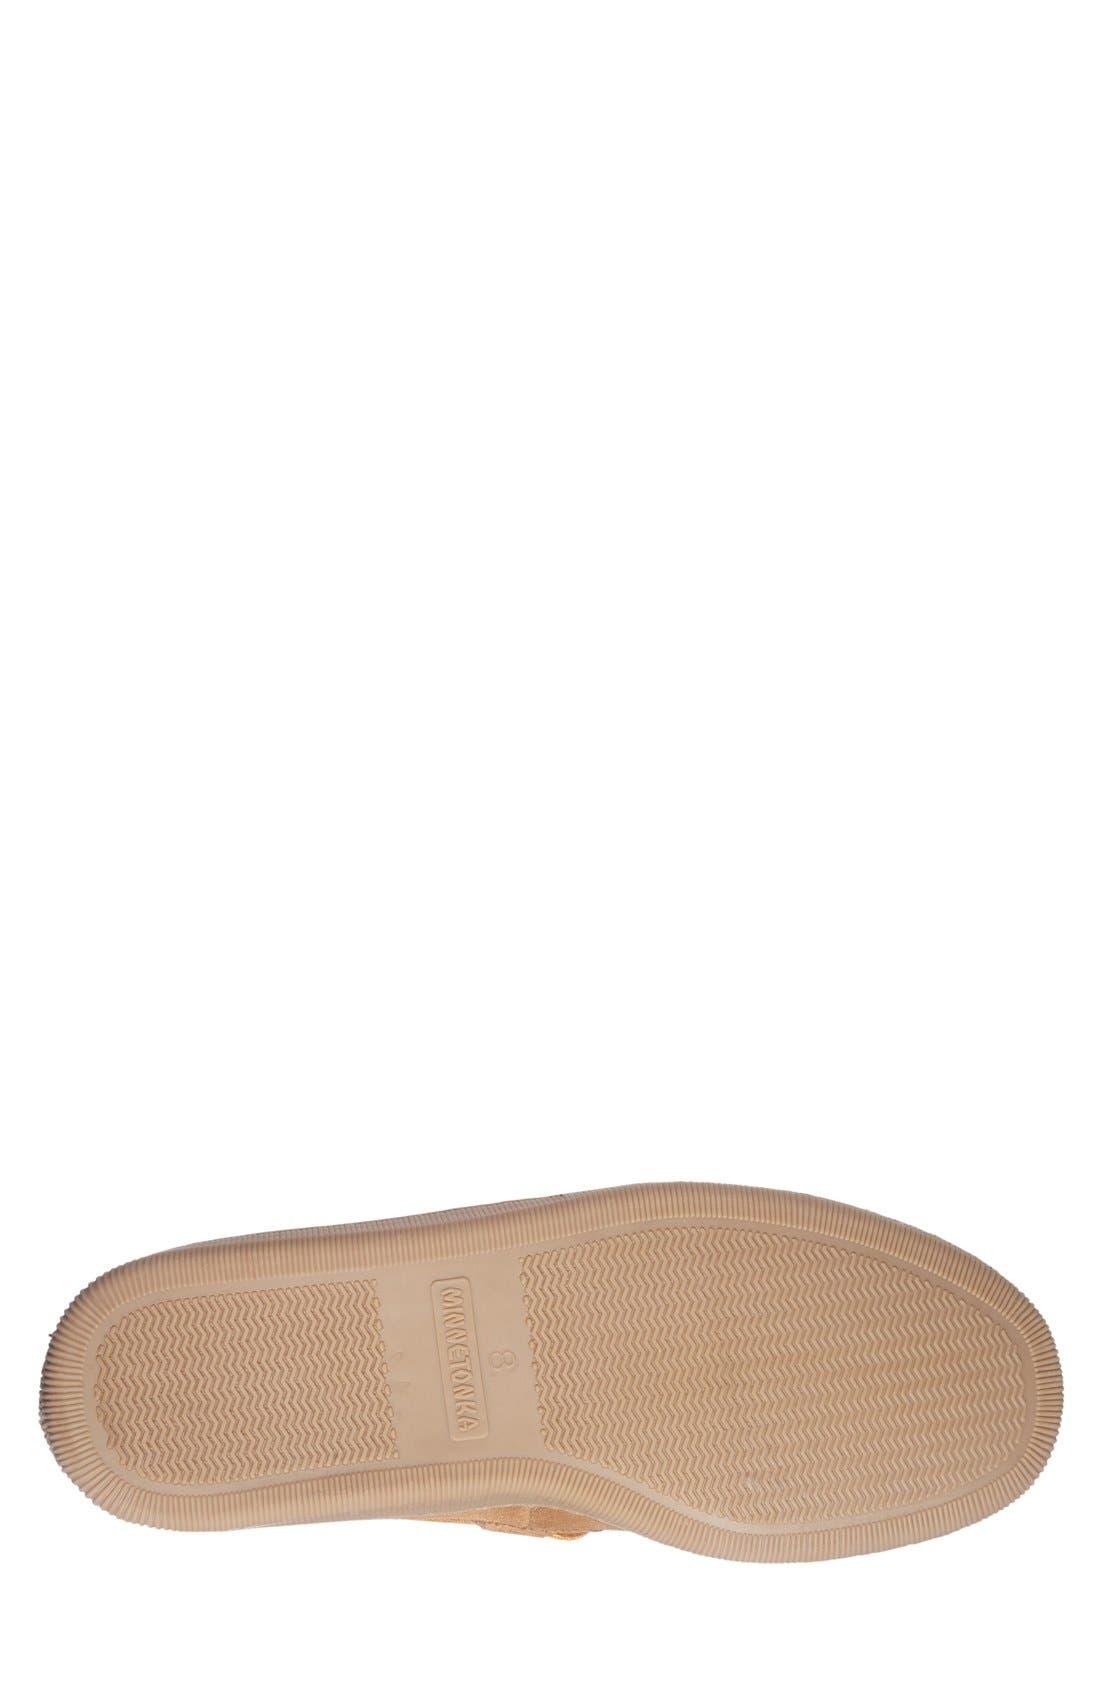 Genuine Shearling Moccasin Slipper,                             Alternate thumbnail 4, color,                             TAN